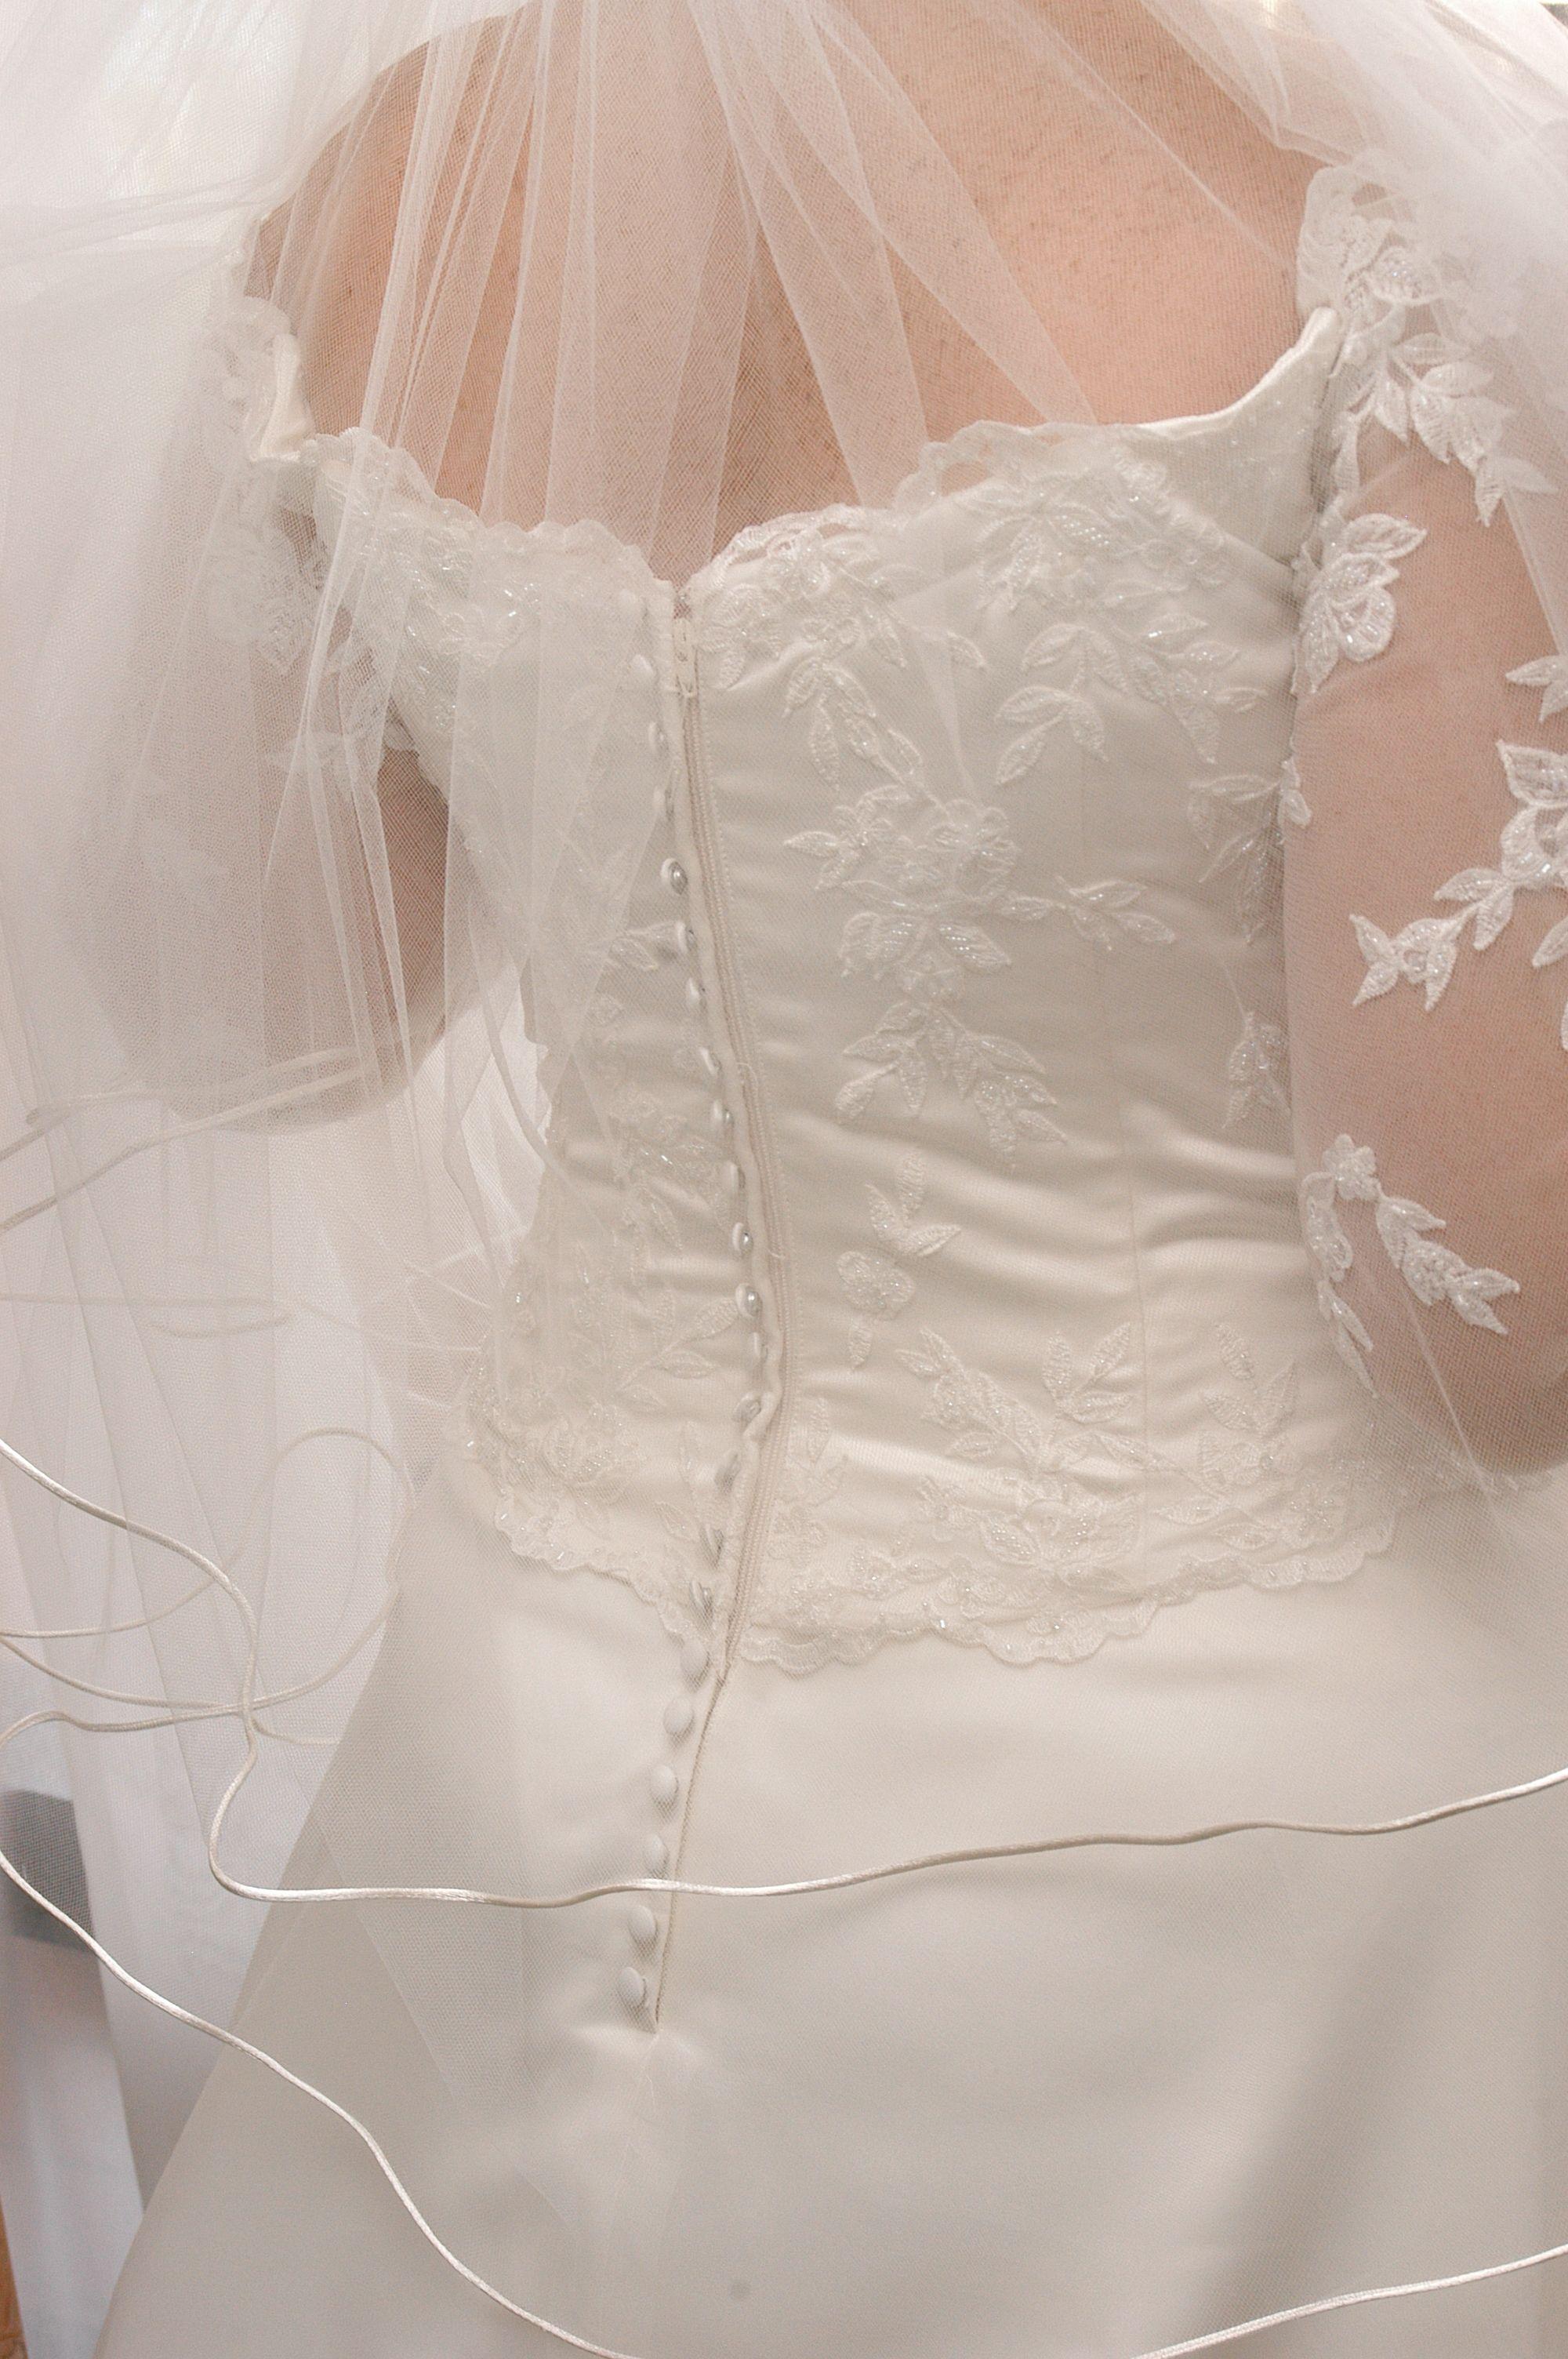 Wedding dresses under $300  Other  Size   Used Wedding Dresses  Wedding Planning